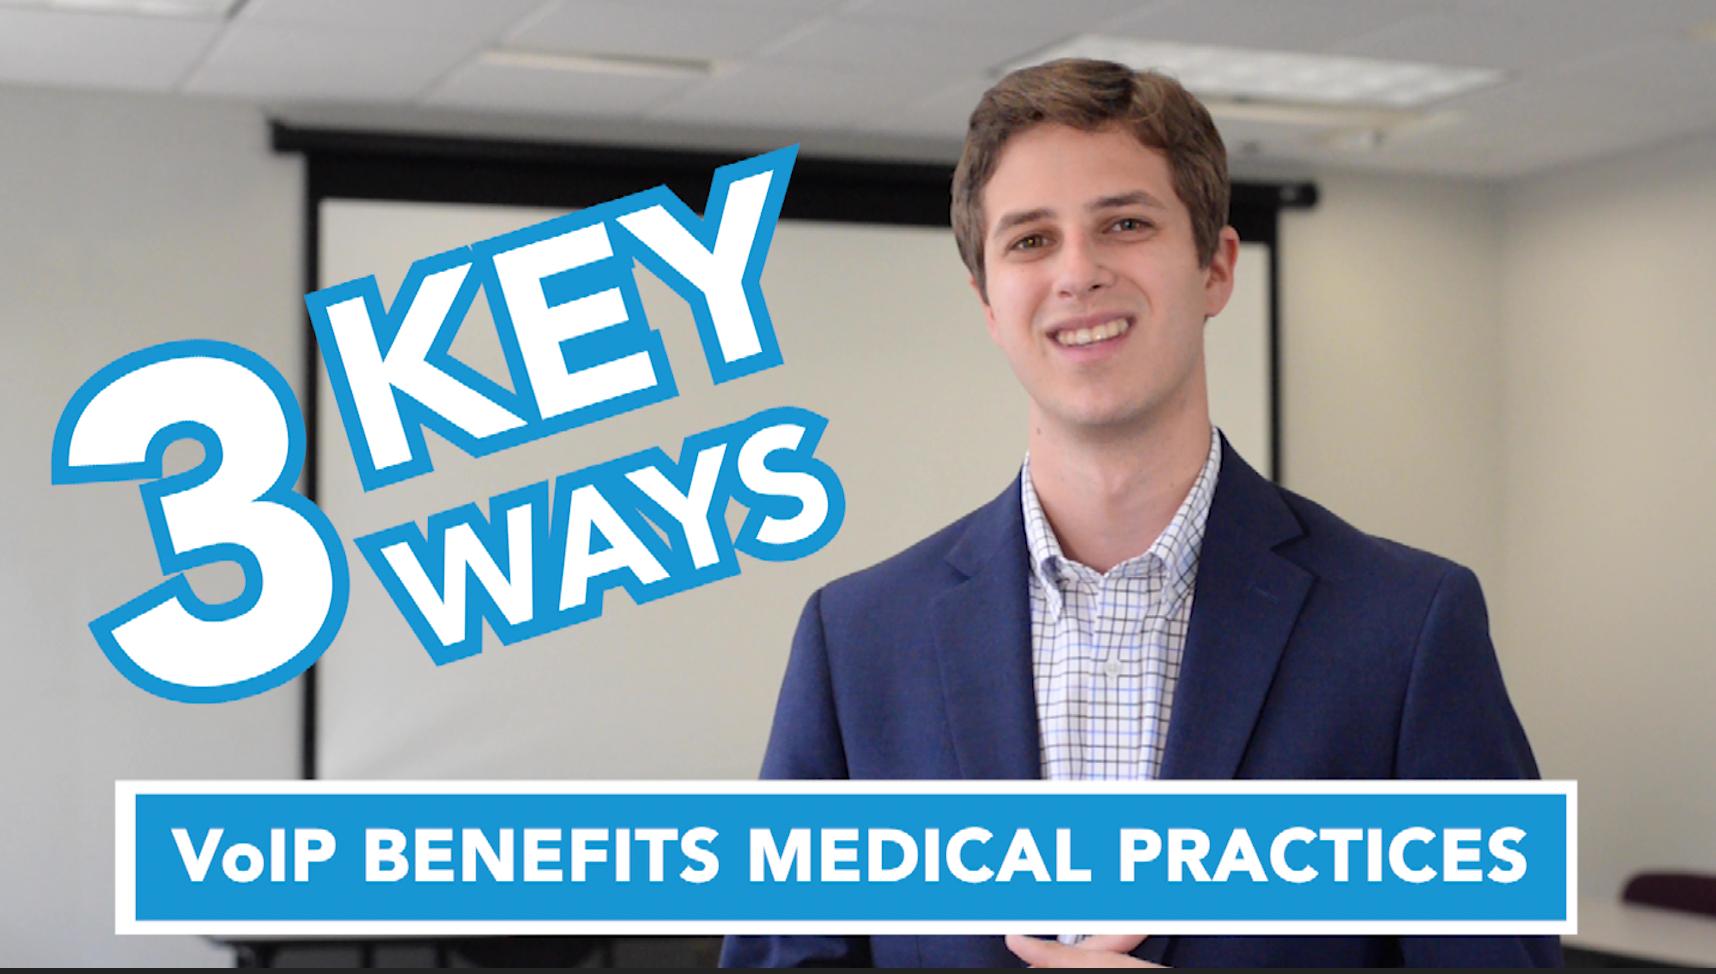 Three Ways VoIP Benefits Medical Practices